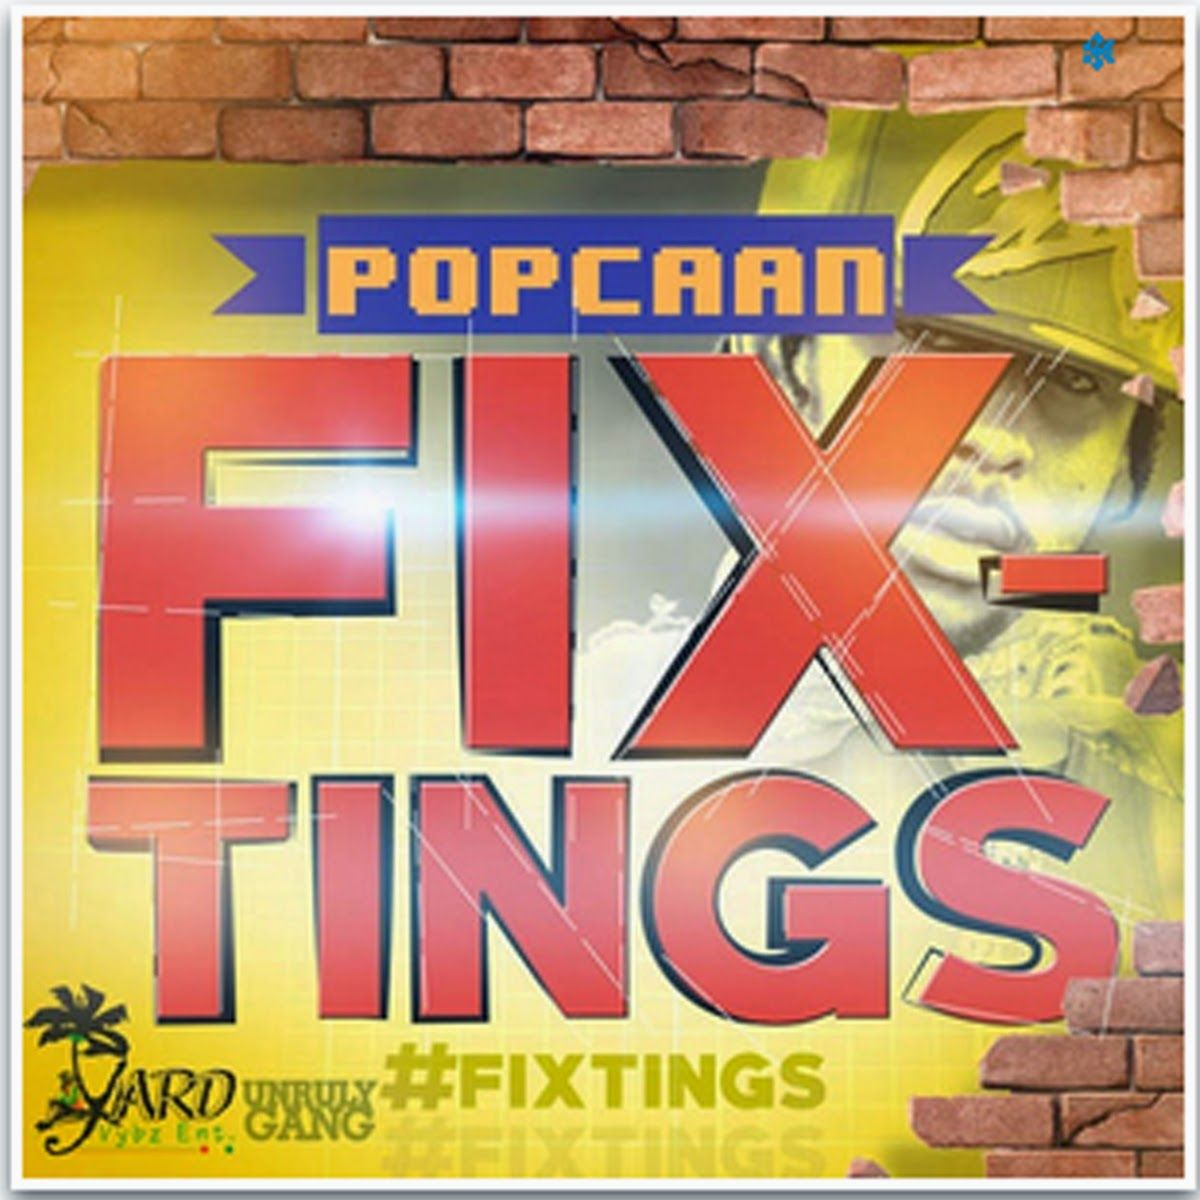 POPCAAN - FIX TINGS - YARD VYBZ ENTERTAINMENT FREE MP3